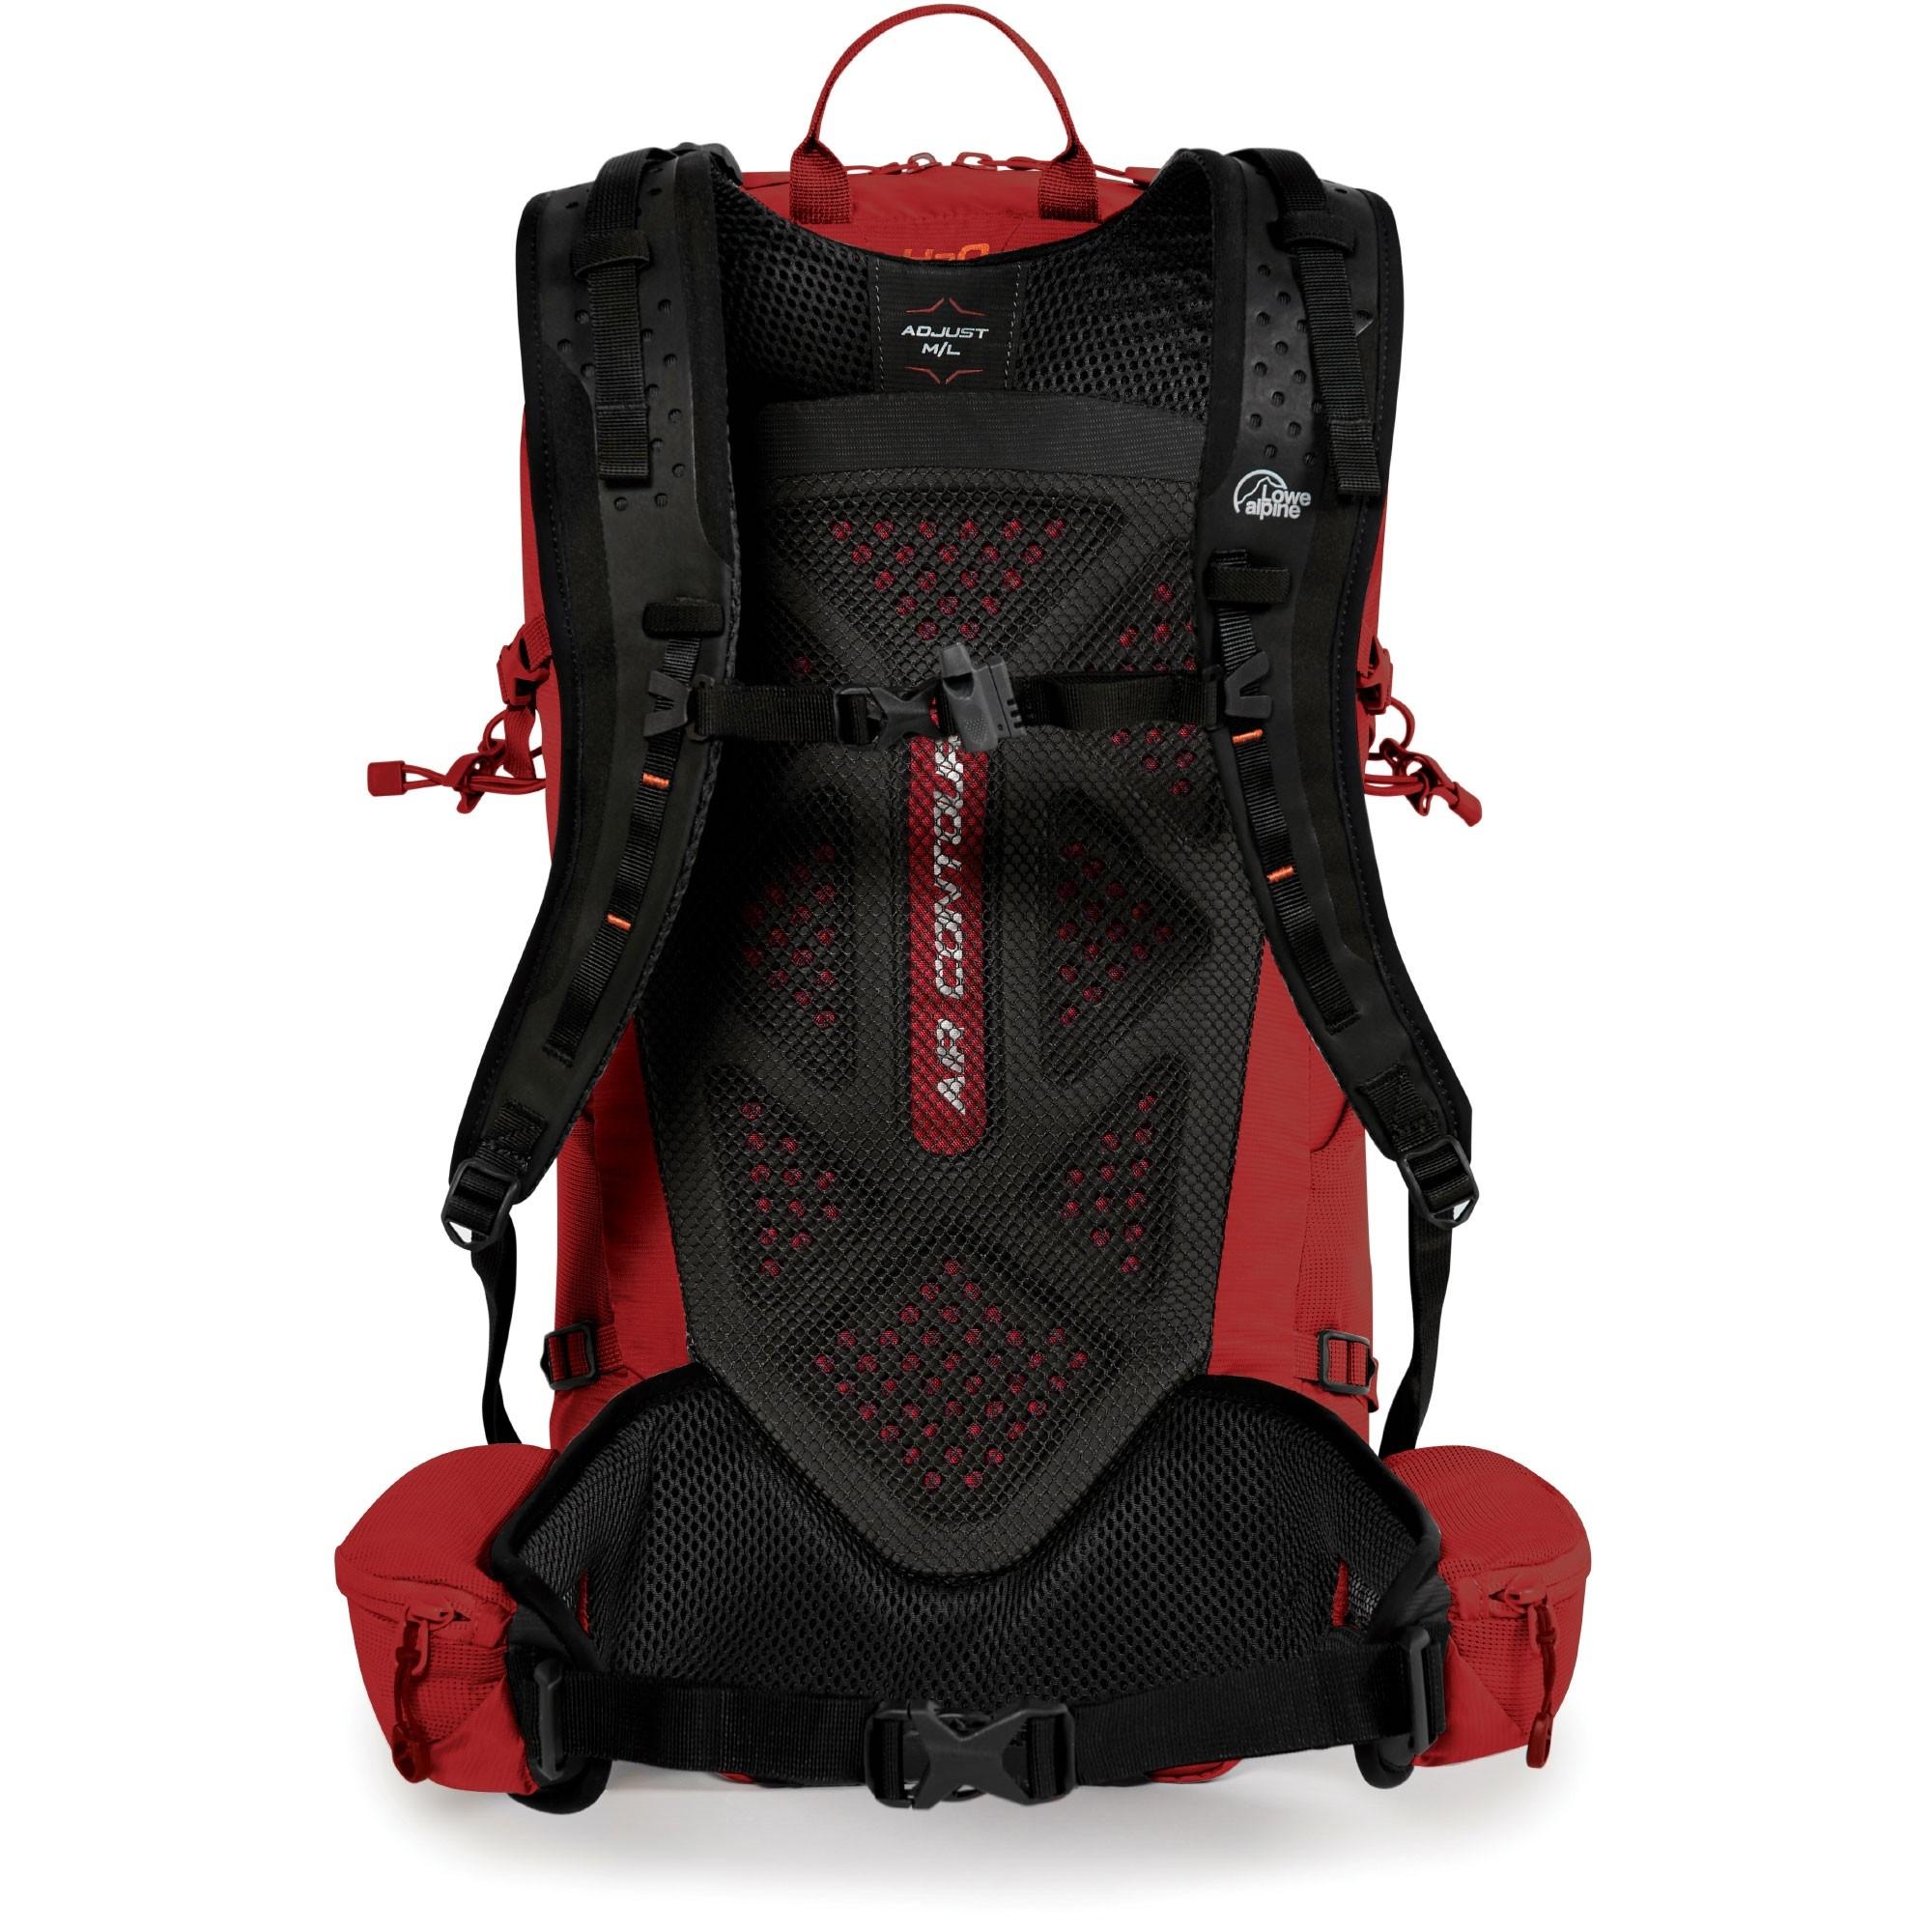 Lowe Alpine Aeon 18 Rucksack - Auburn - Back System